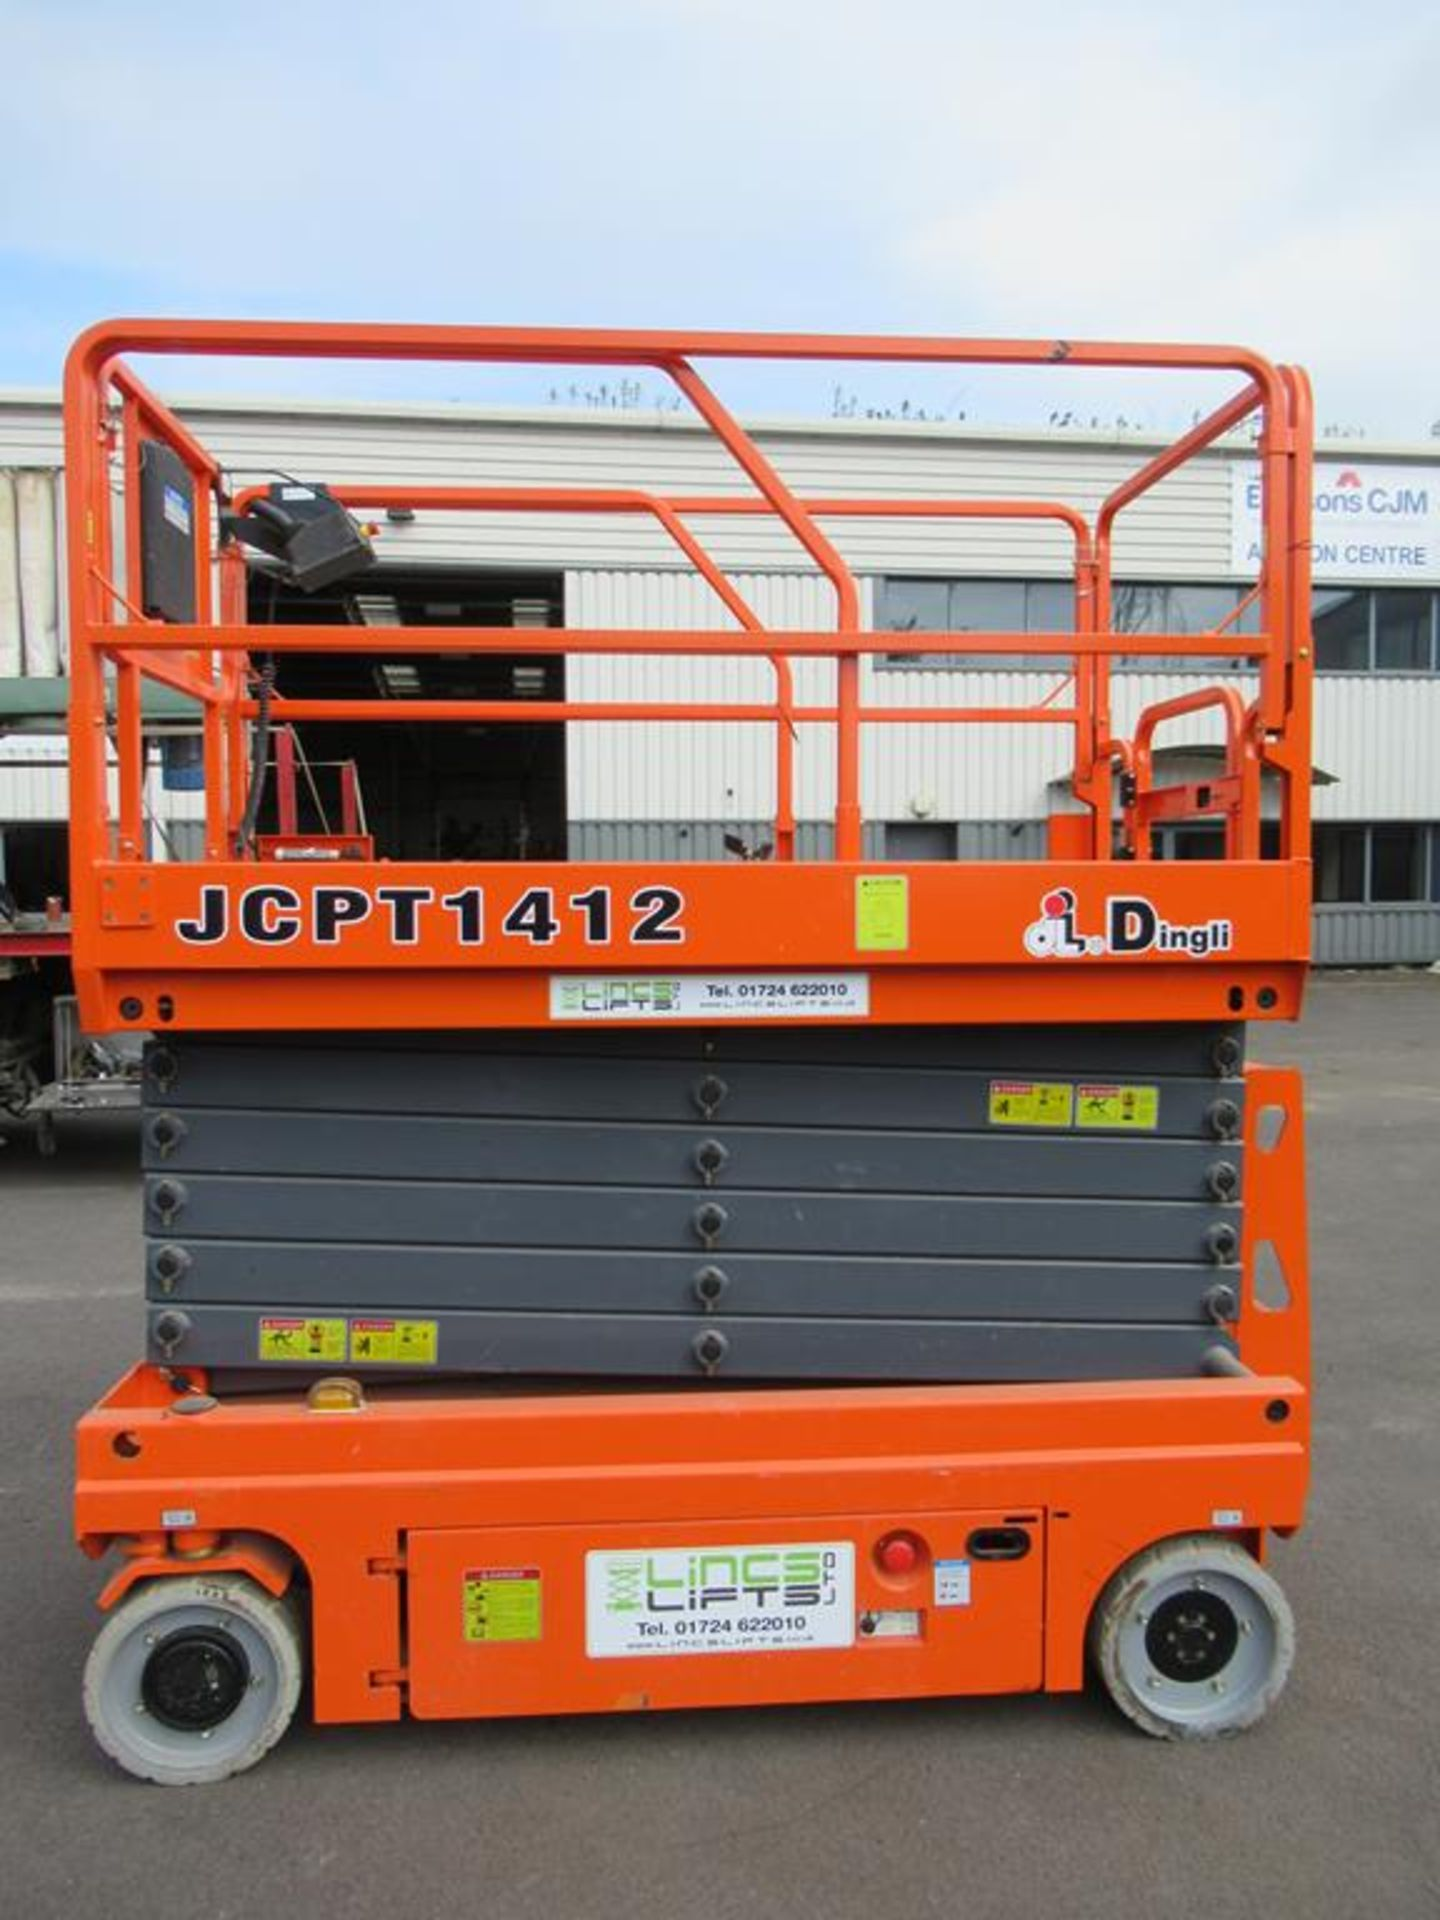 Dingli JCPT 1412 DC 24V electric scissor lift - Image 2 of 6